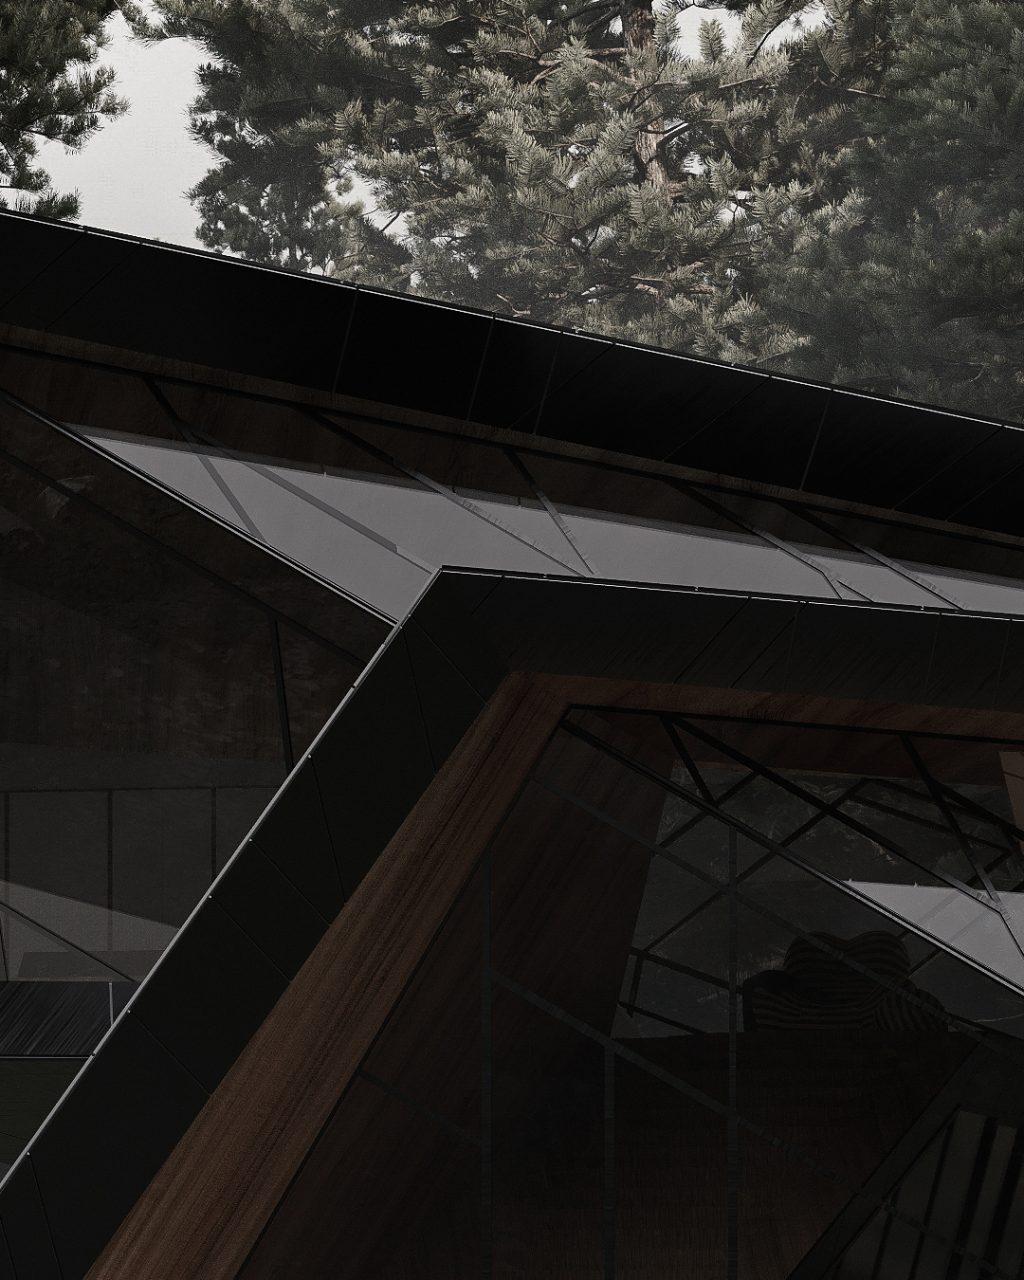 Blackbird una capanna rifugio by Stipfold